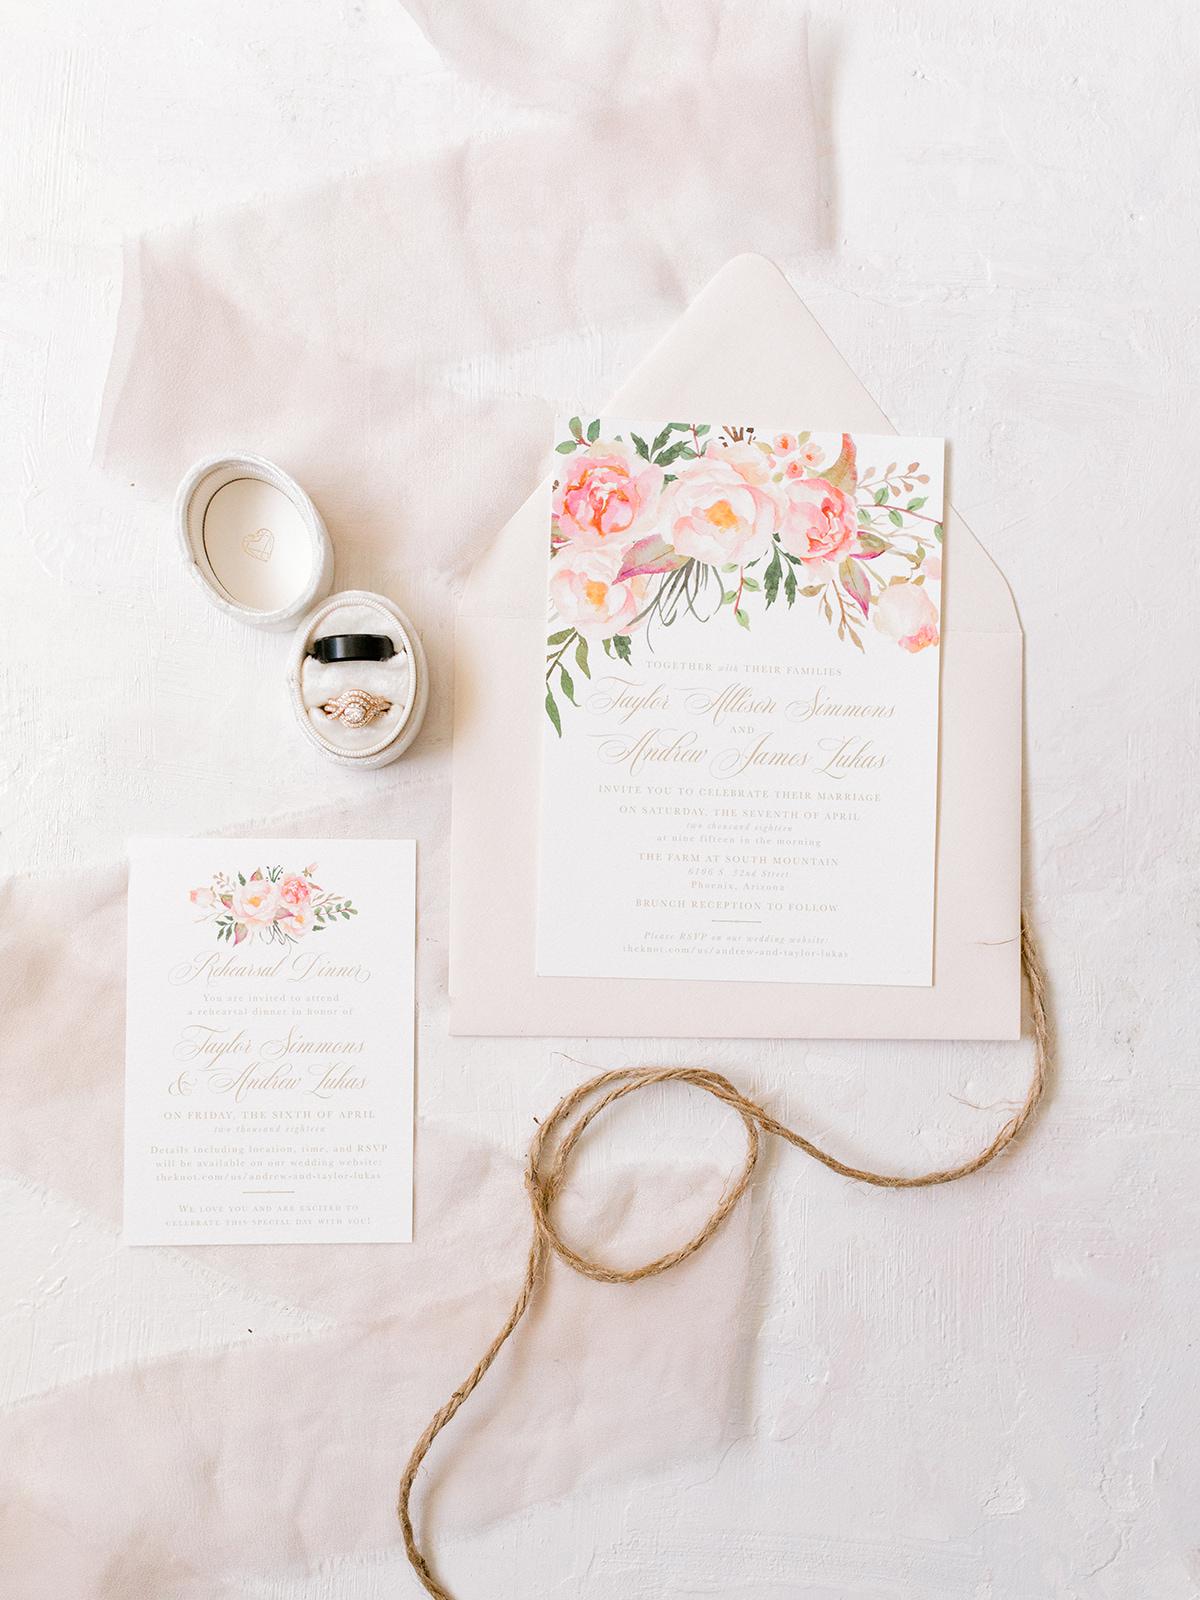 Lukas Wedding - Details-7.jpg